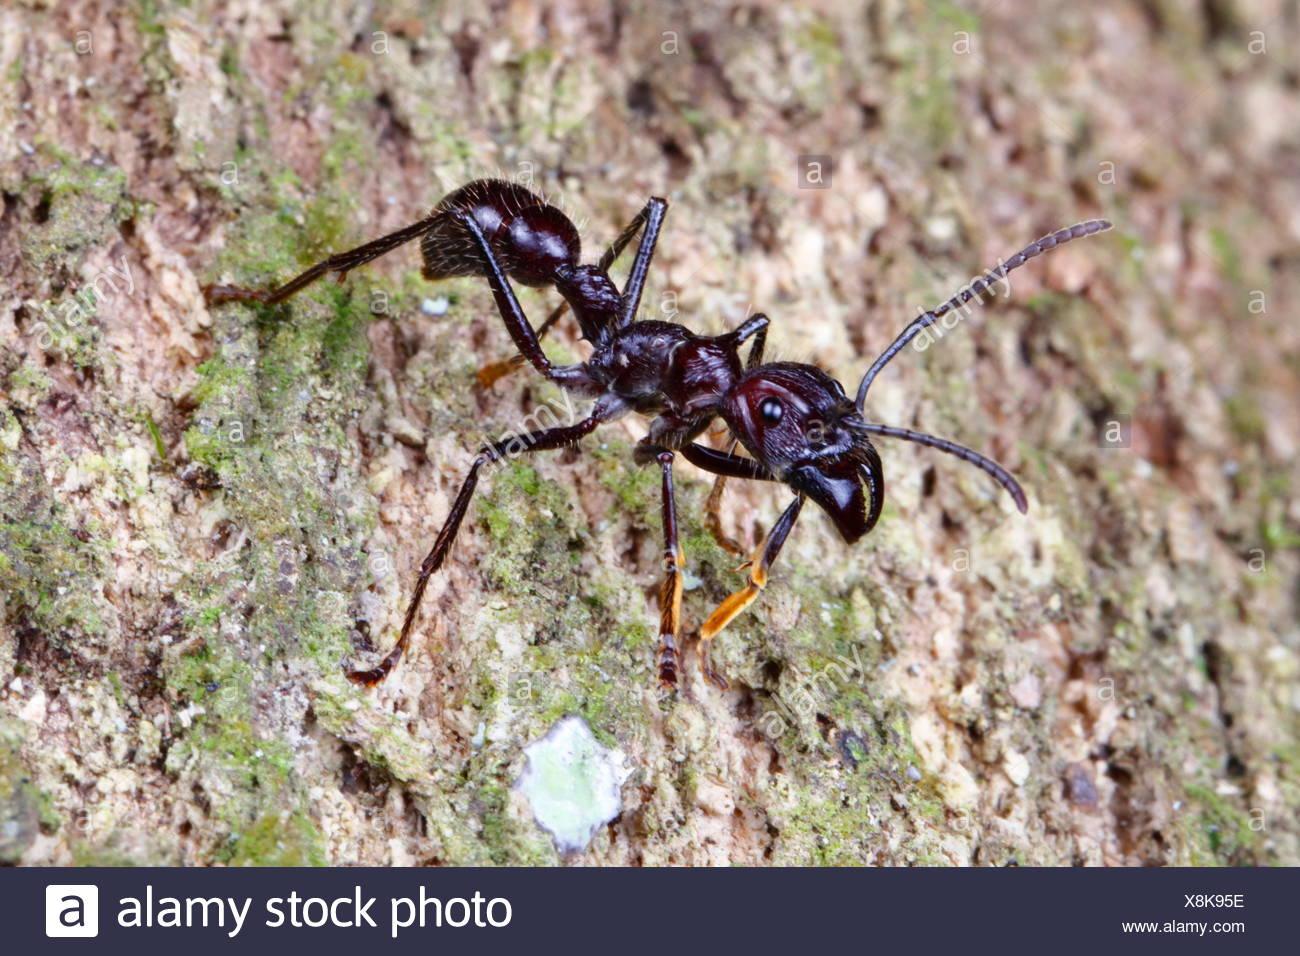 A bullet ant, Paraponera clavata, crawling. Stock Photo